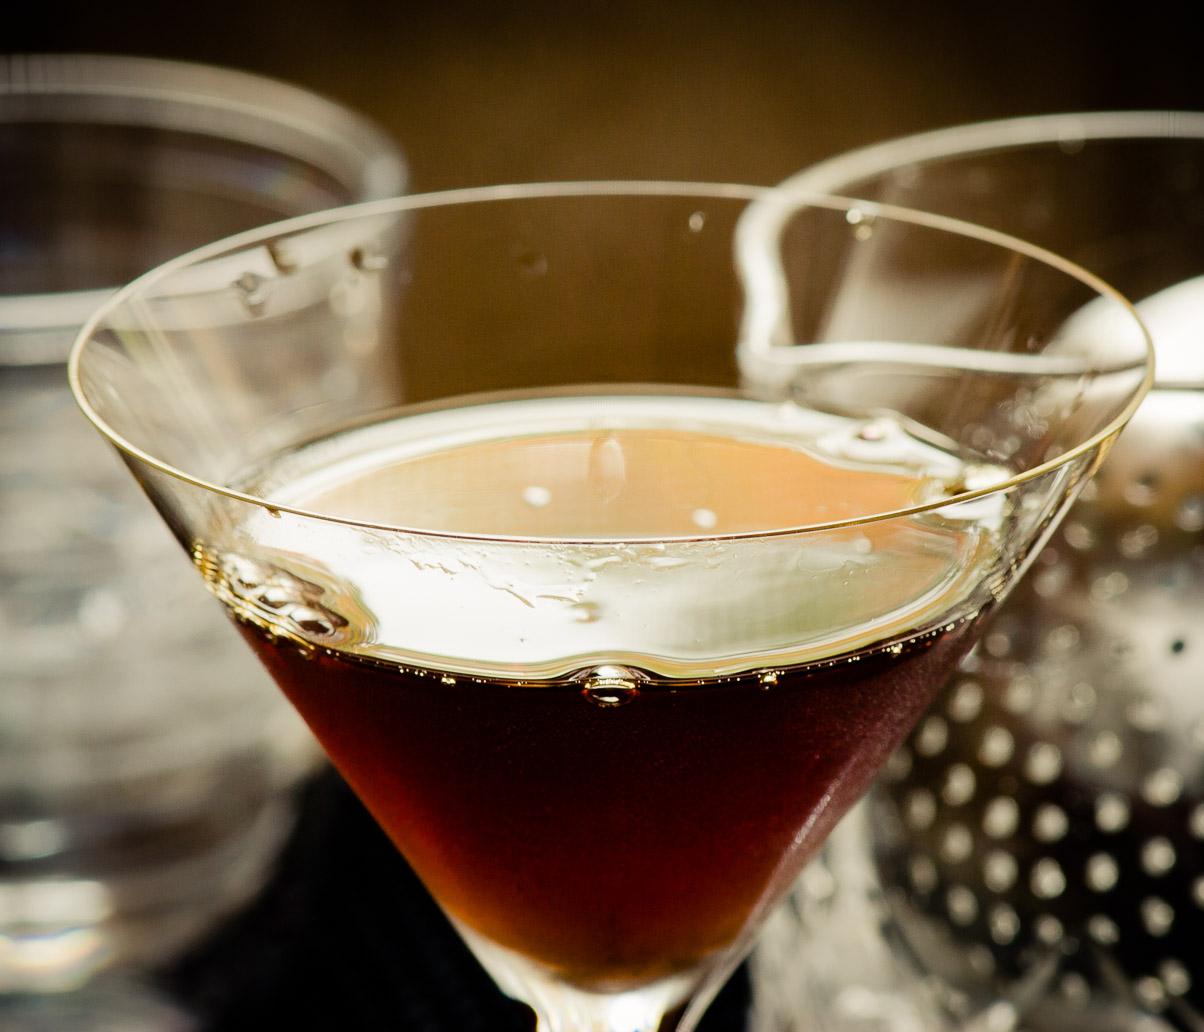 Cocktail m&m's